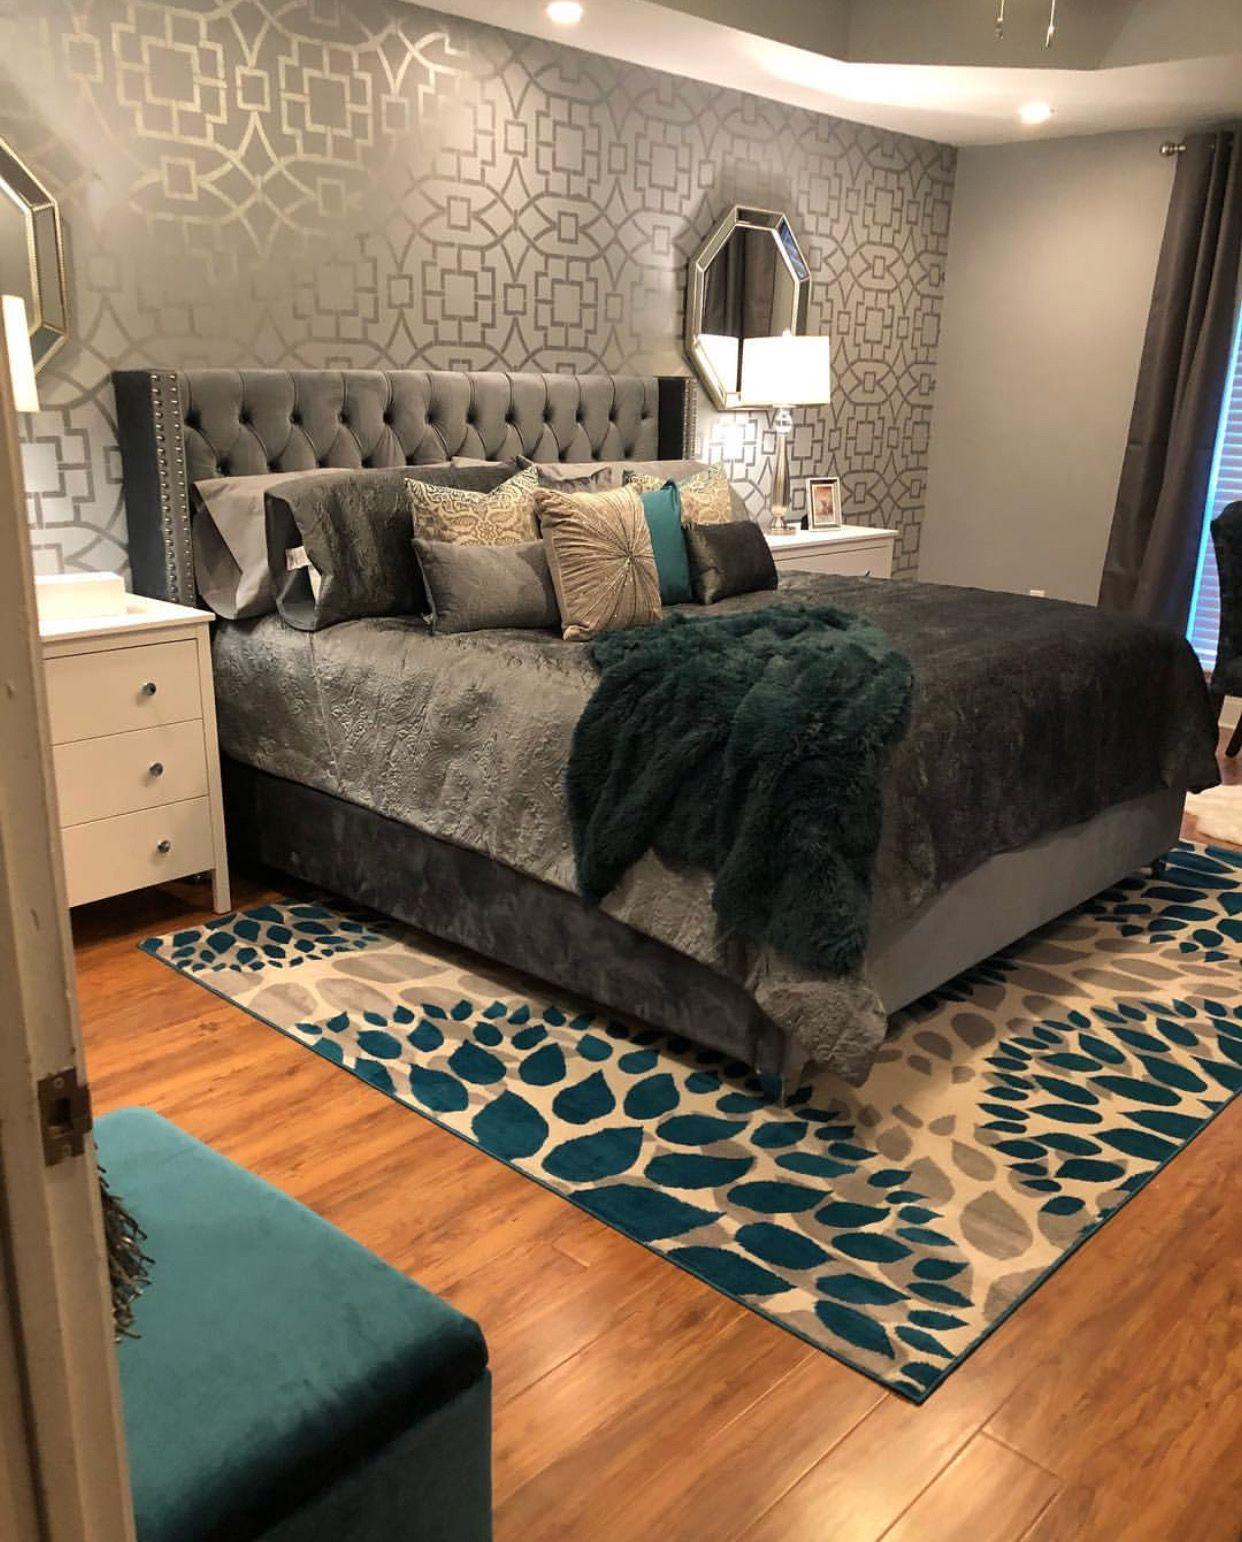 Pinterest Follow Me Xxlatykka Snapchat Xa Ja Twitter X Aja Instagram Aja Master Bedrooms Decor Bedroom Design Bedroom Makeover